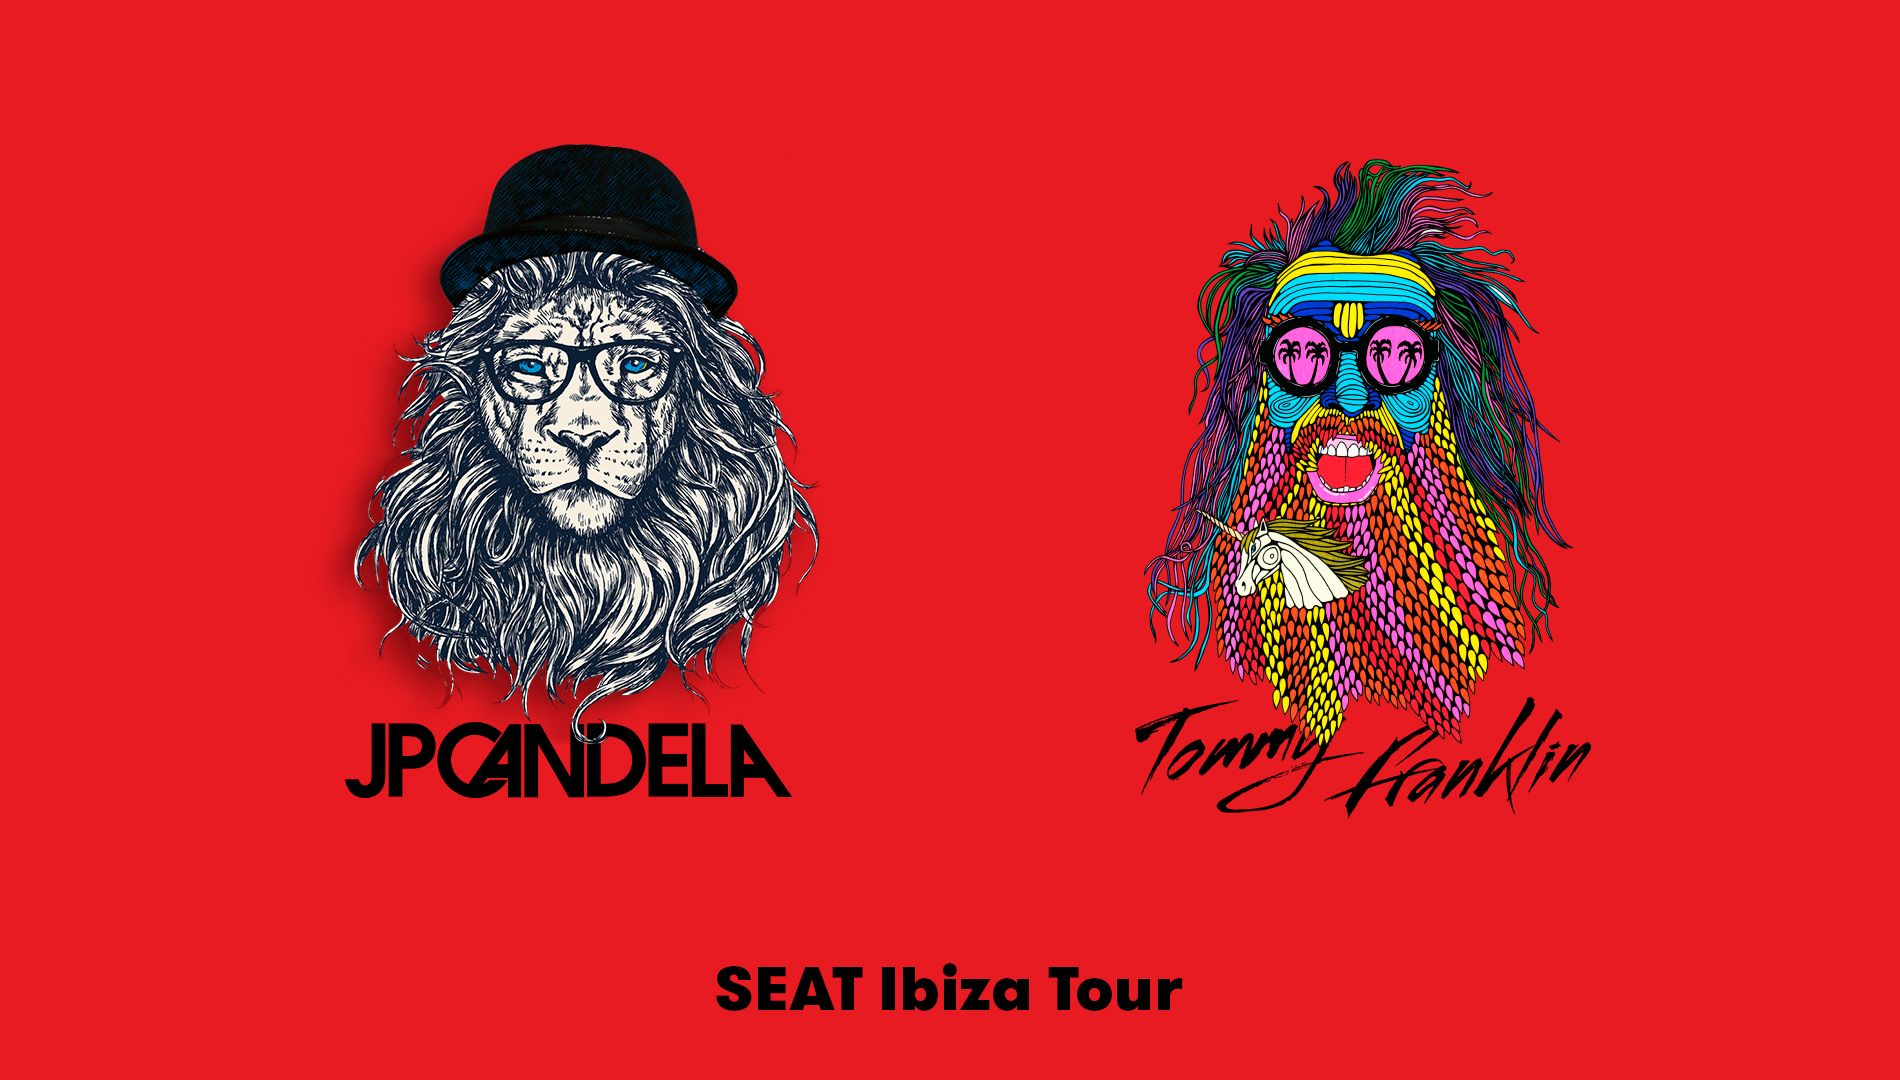 Vive el SEAT Ibiza Tour